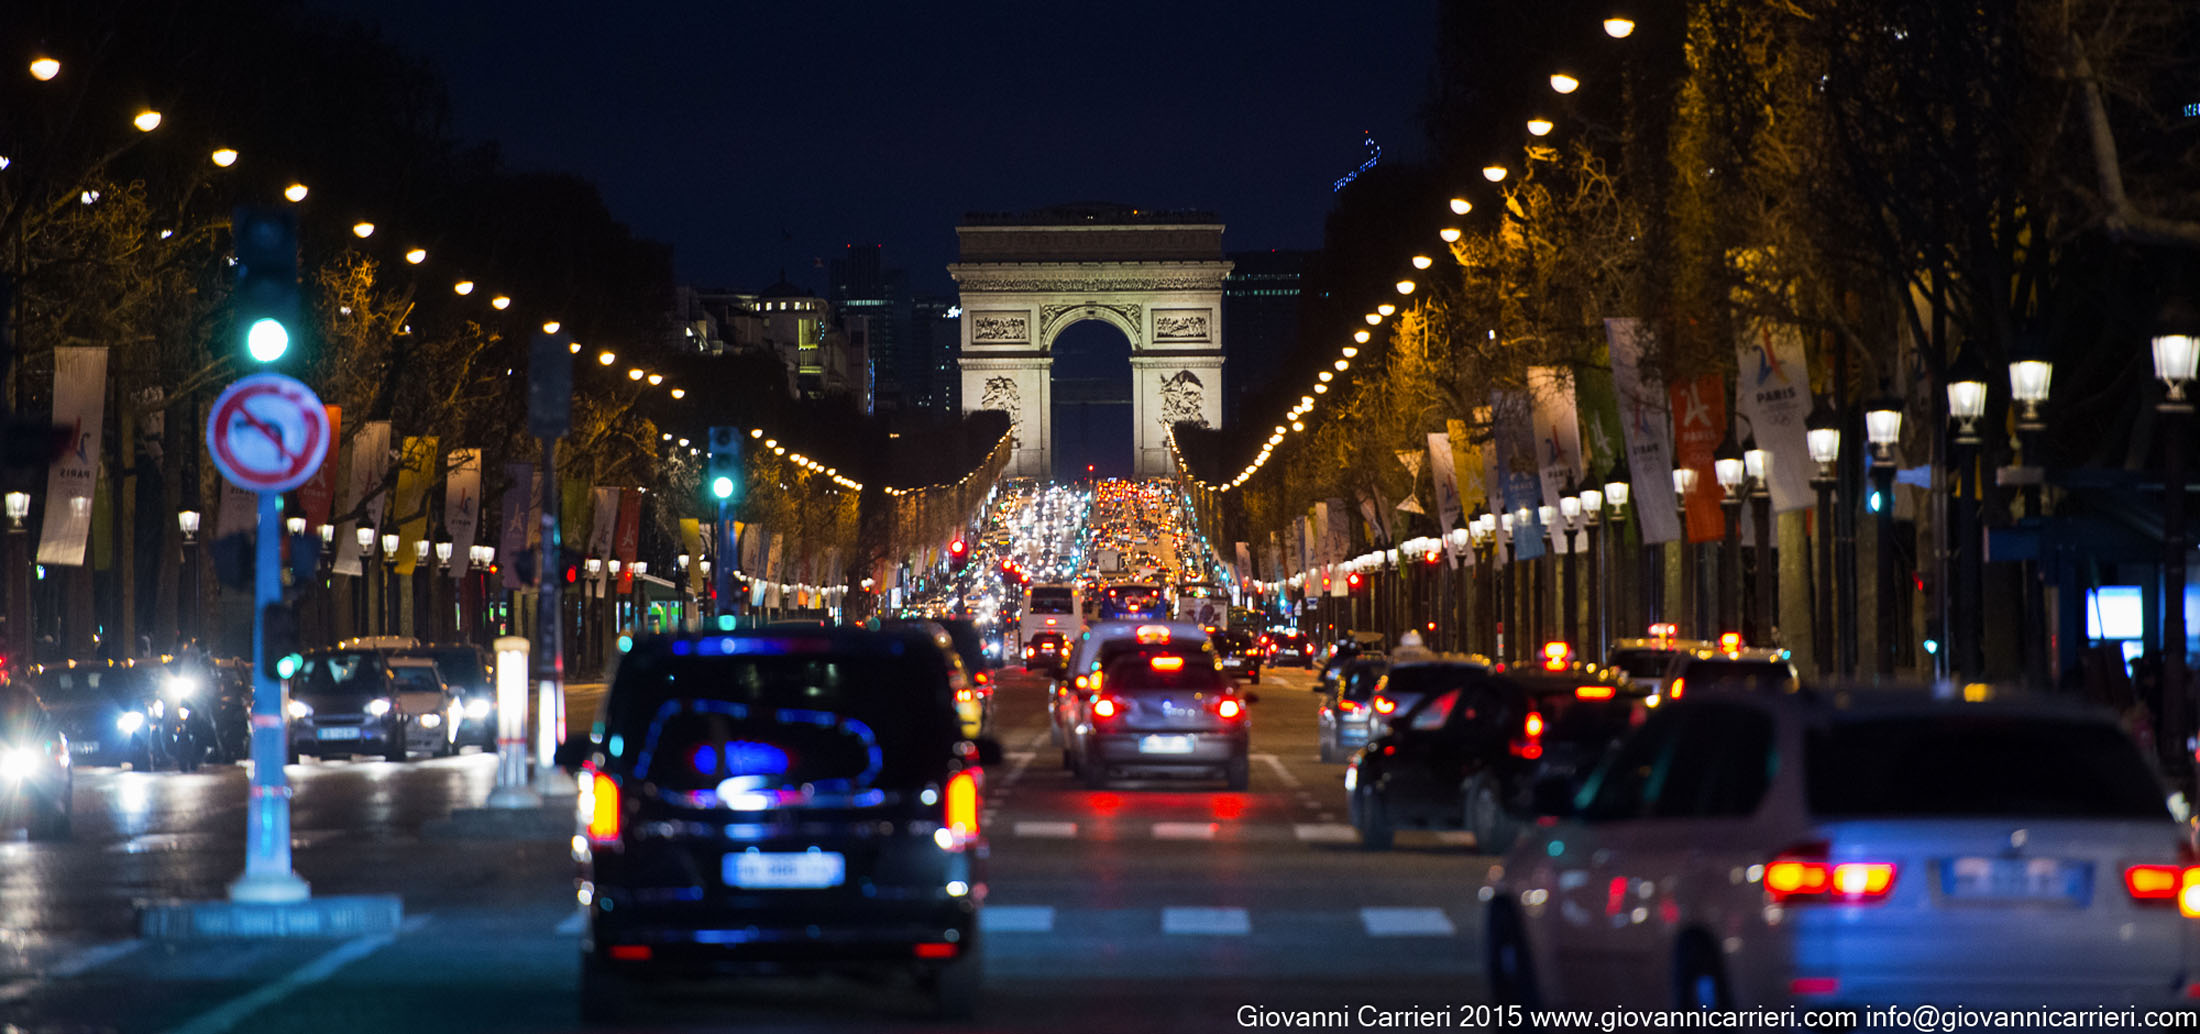 L'Arco di Trionfo e gli Champs Élysées